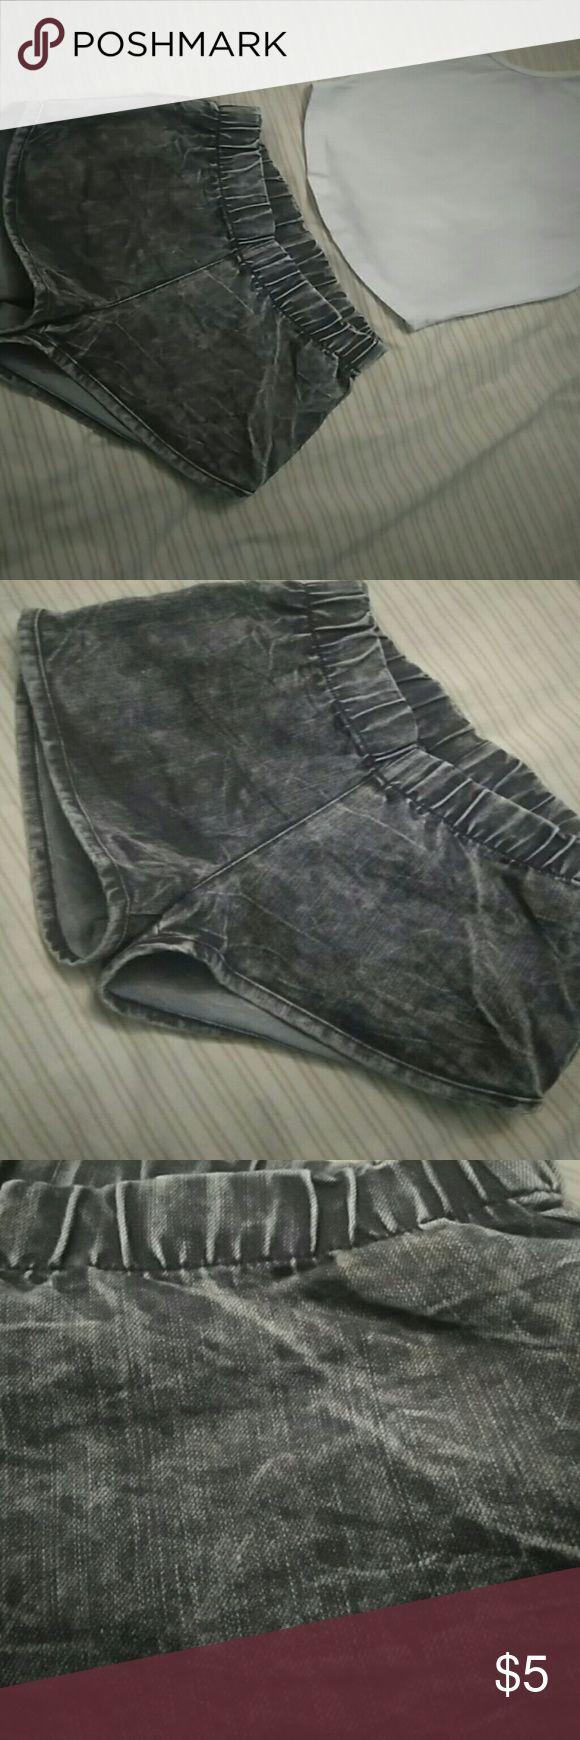 Shorts Elastic waist band, acid wash shorts. Short fit Shorts